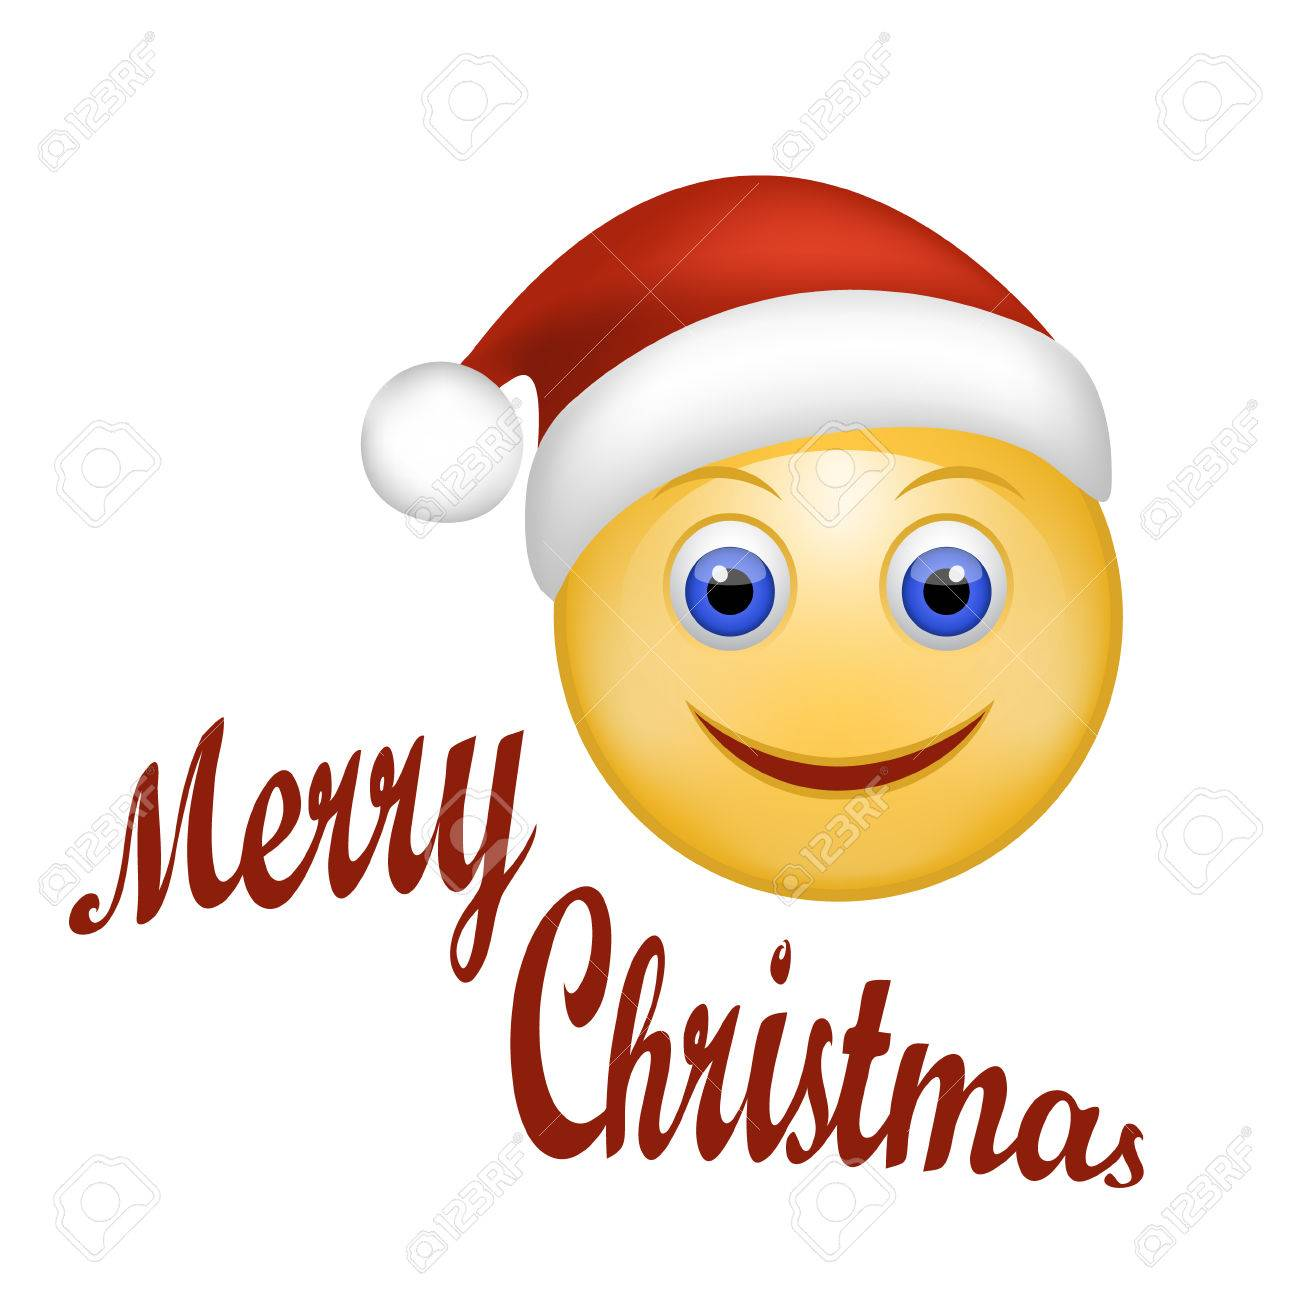 1 174 smiley face cartoon christmas stock vector illustration and rh 123rf com Yummy Smiley Face Clip Art Santa Smiley Face Clip Art